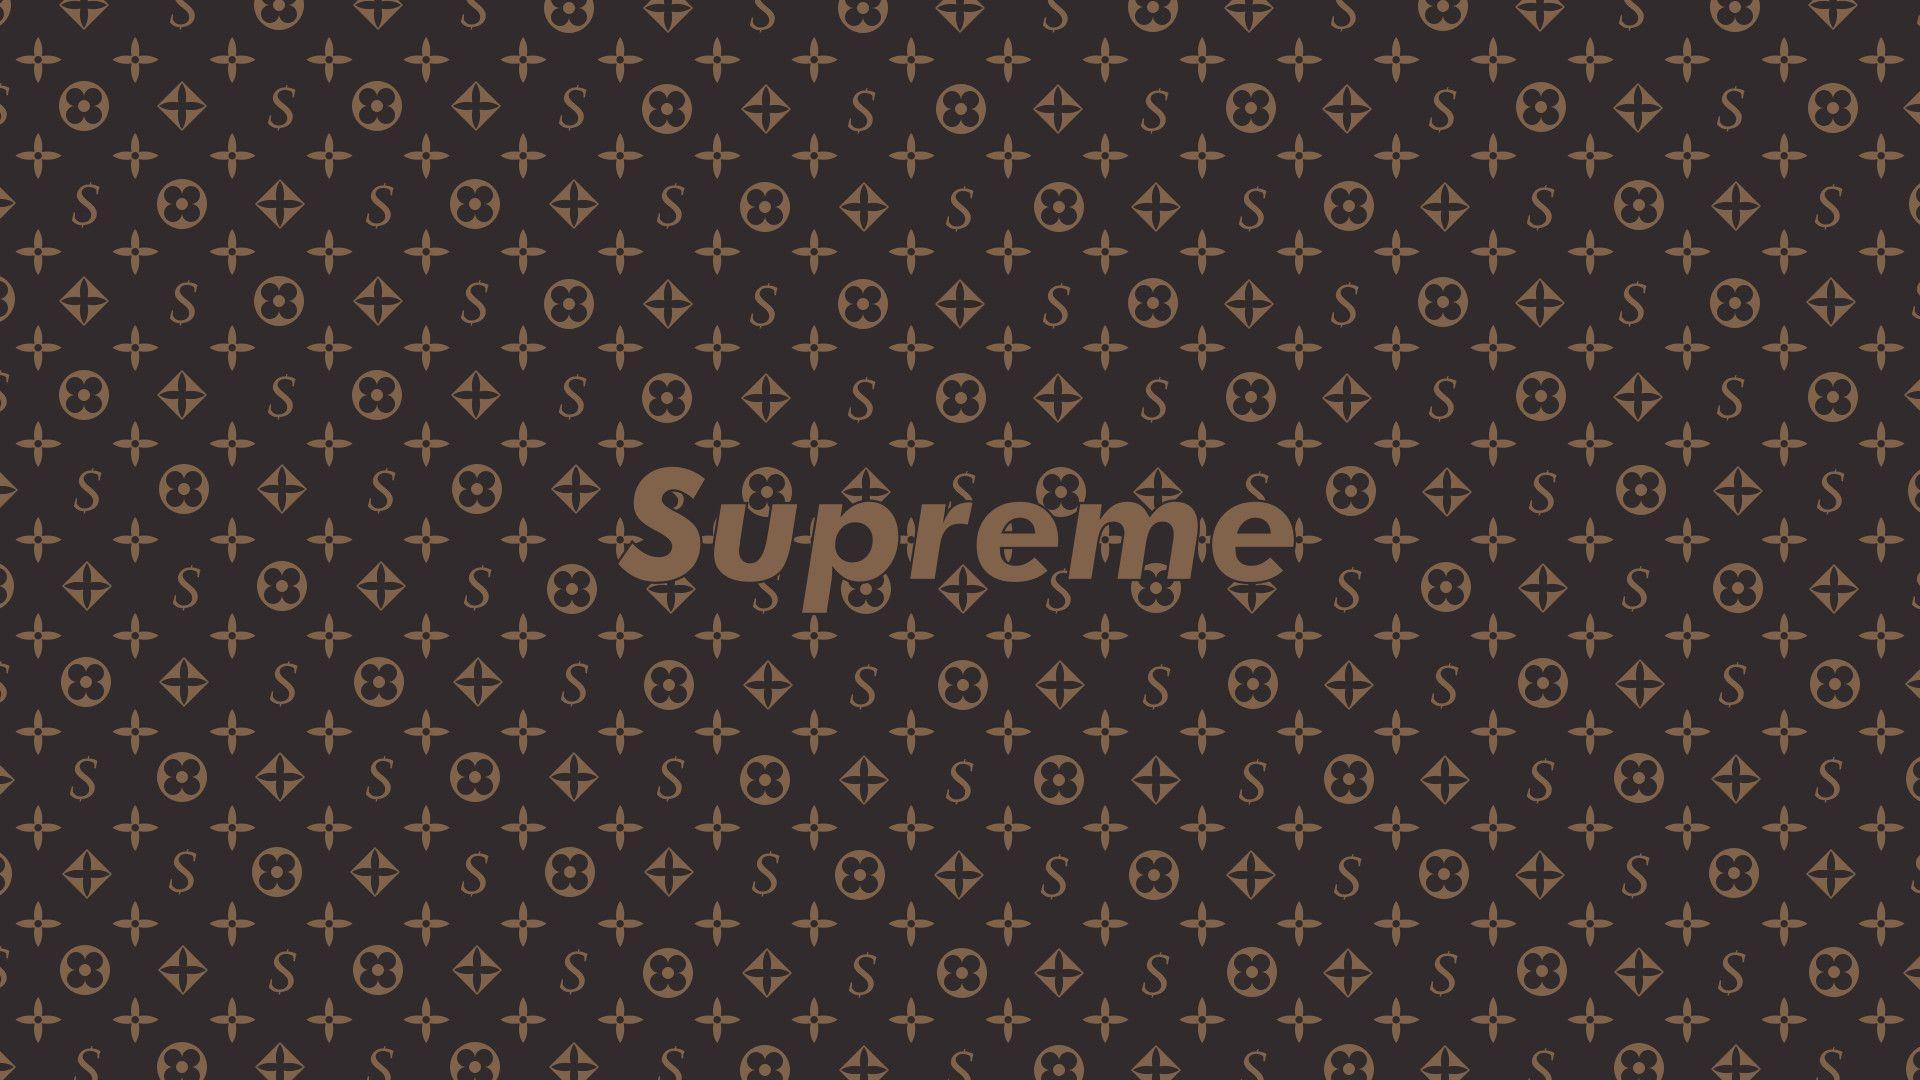 Louis Vuitton Desktop Wallpapers Top Free Louis Vuitton